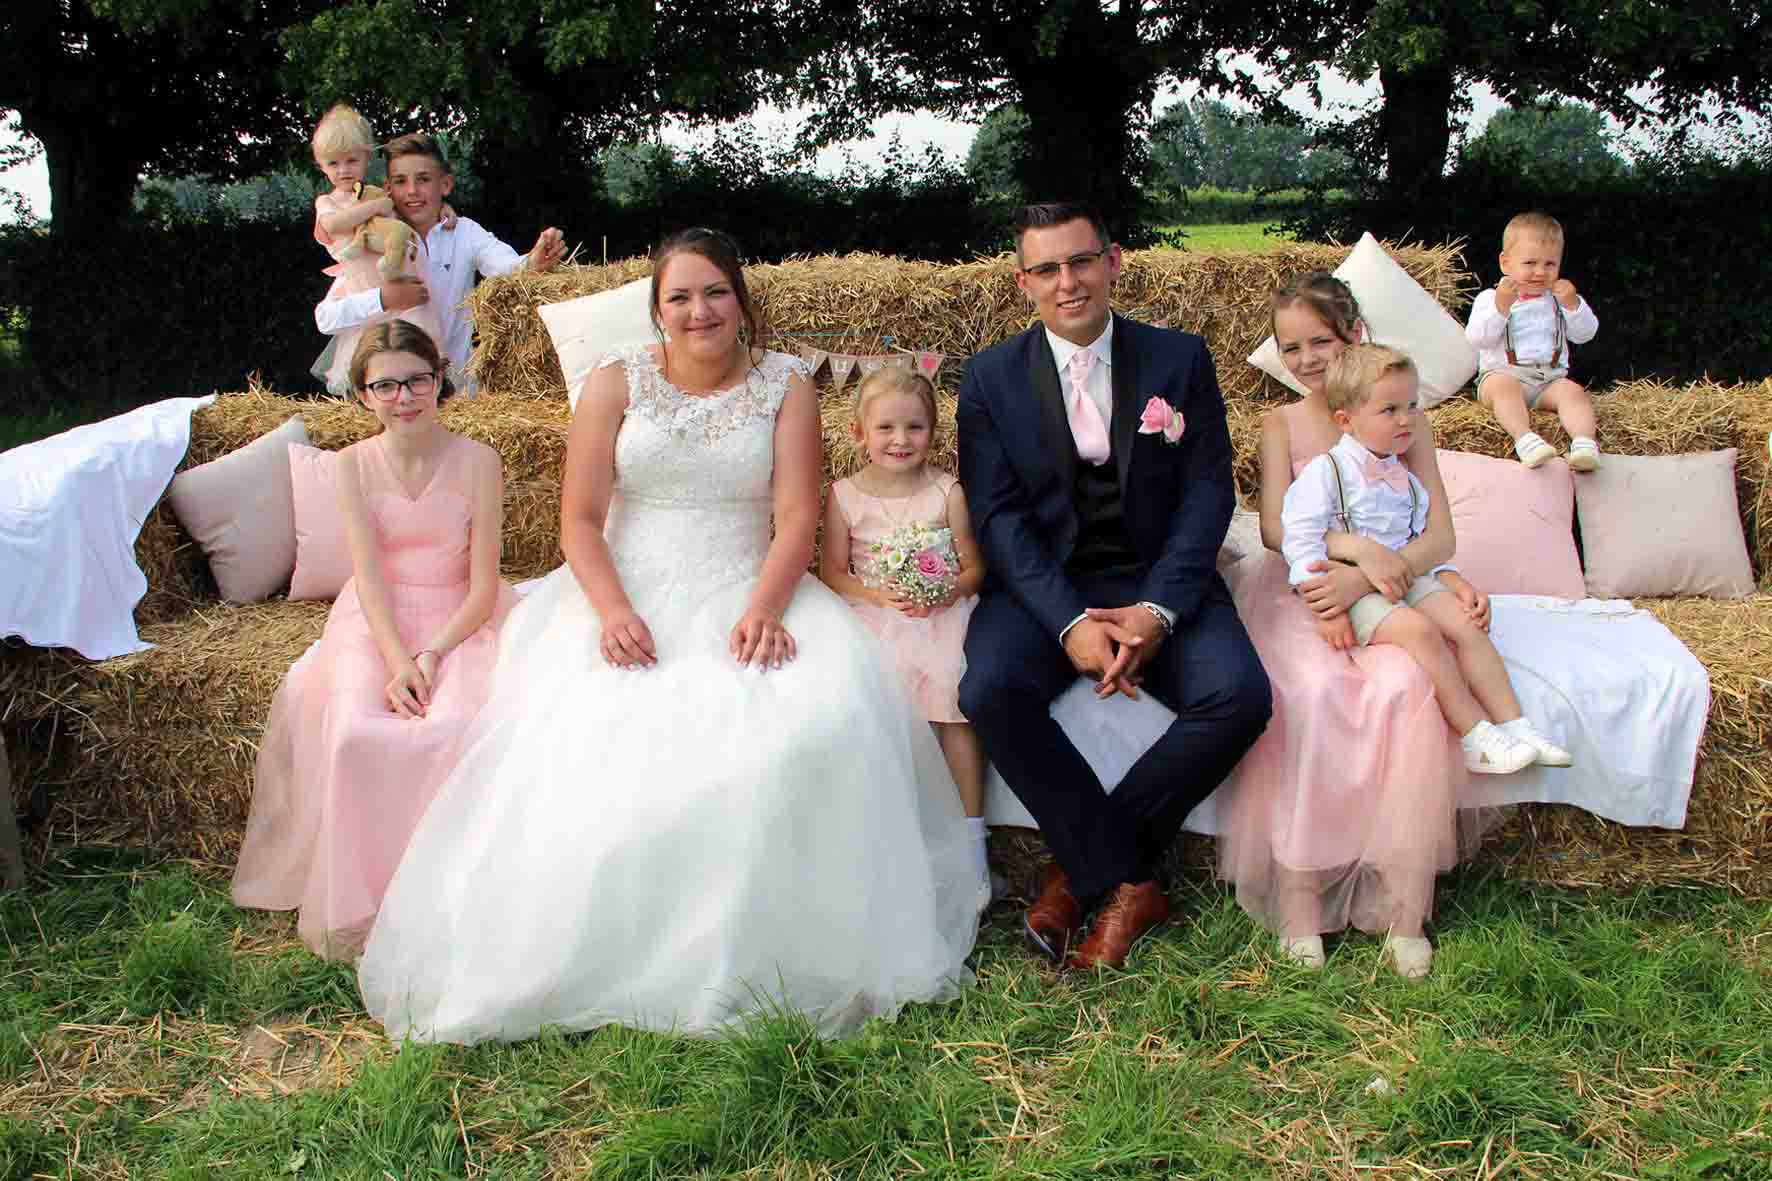 Joveniaux photographe solesmes mariage